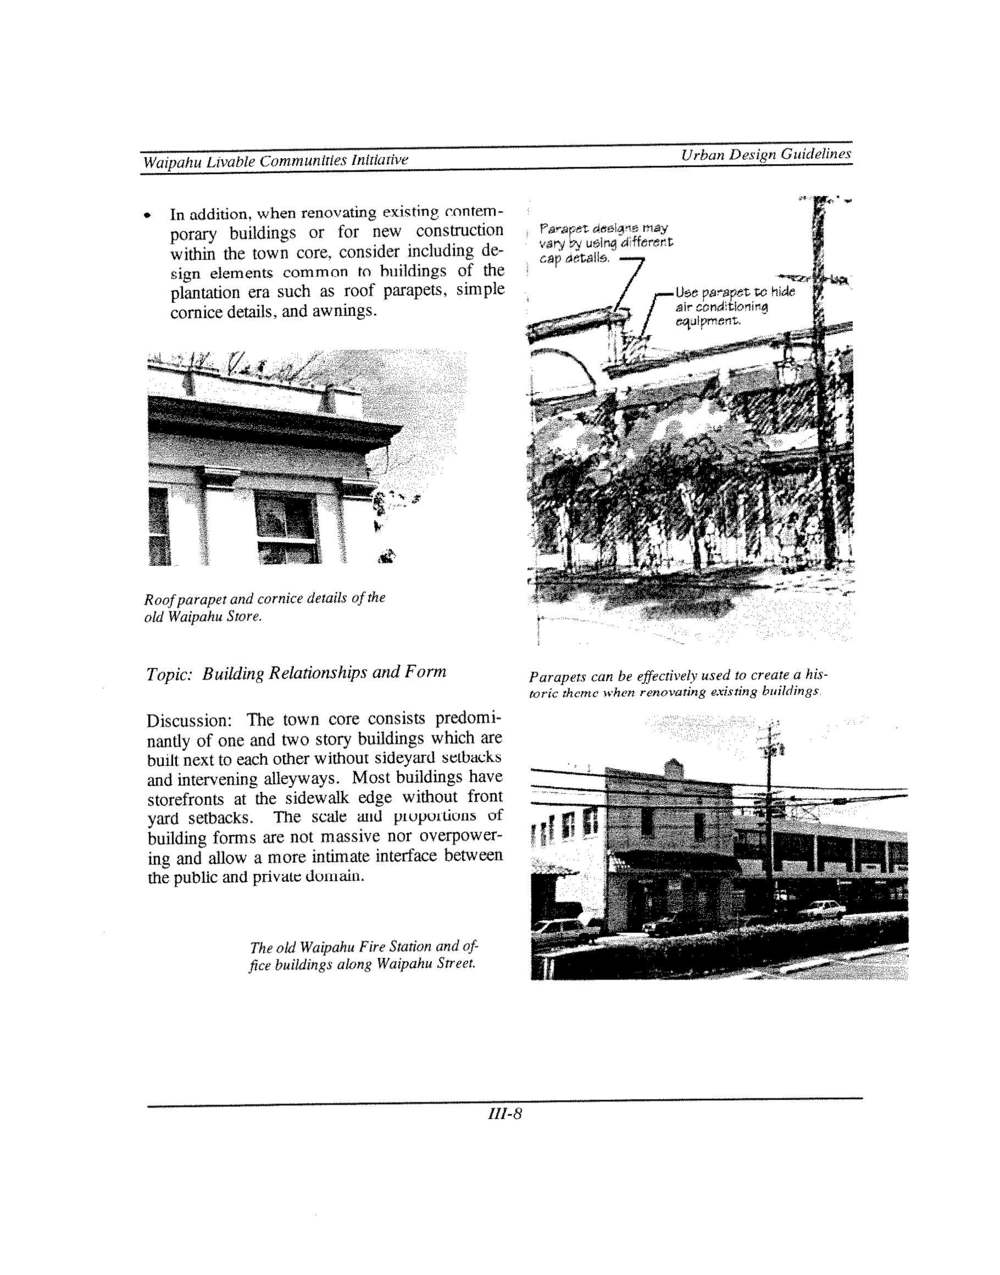 160531_WaipahuLivableCommunities(1998)_Page_098.jpg